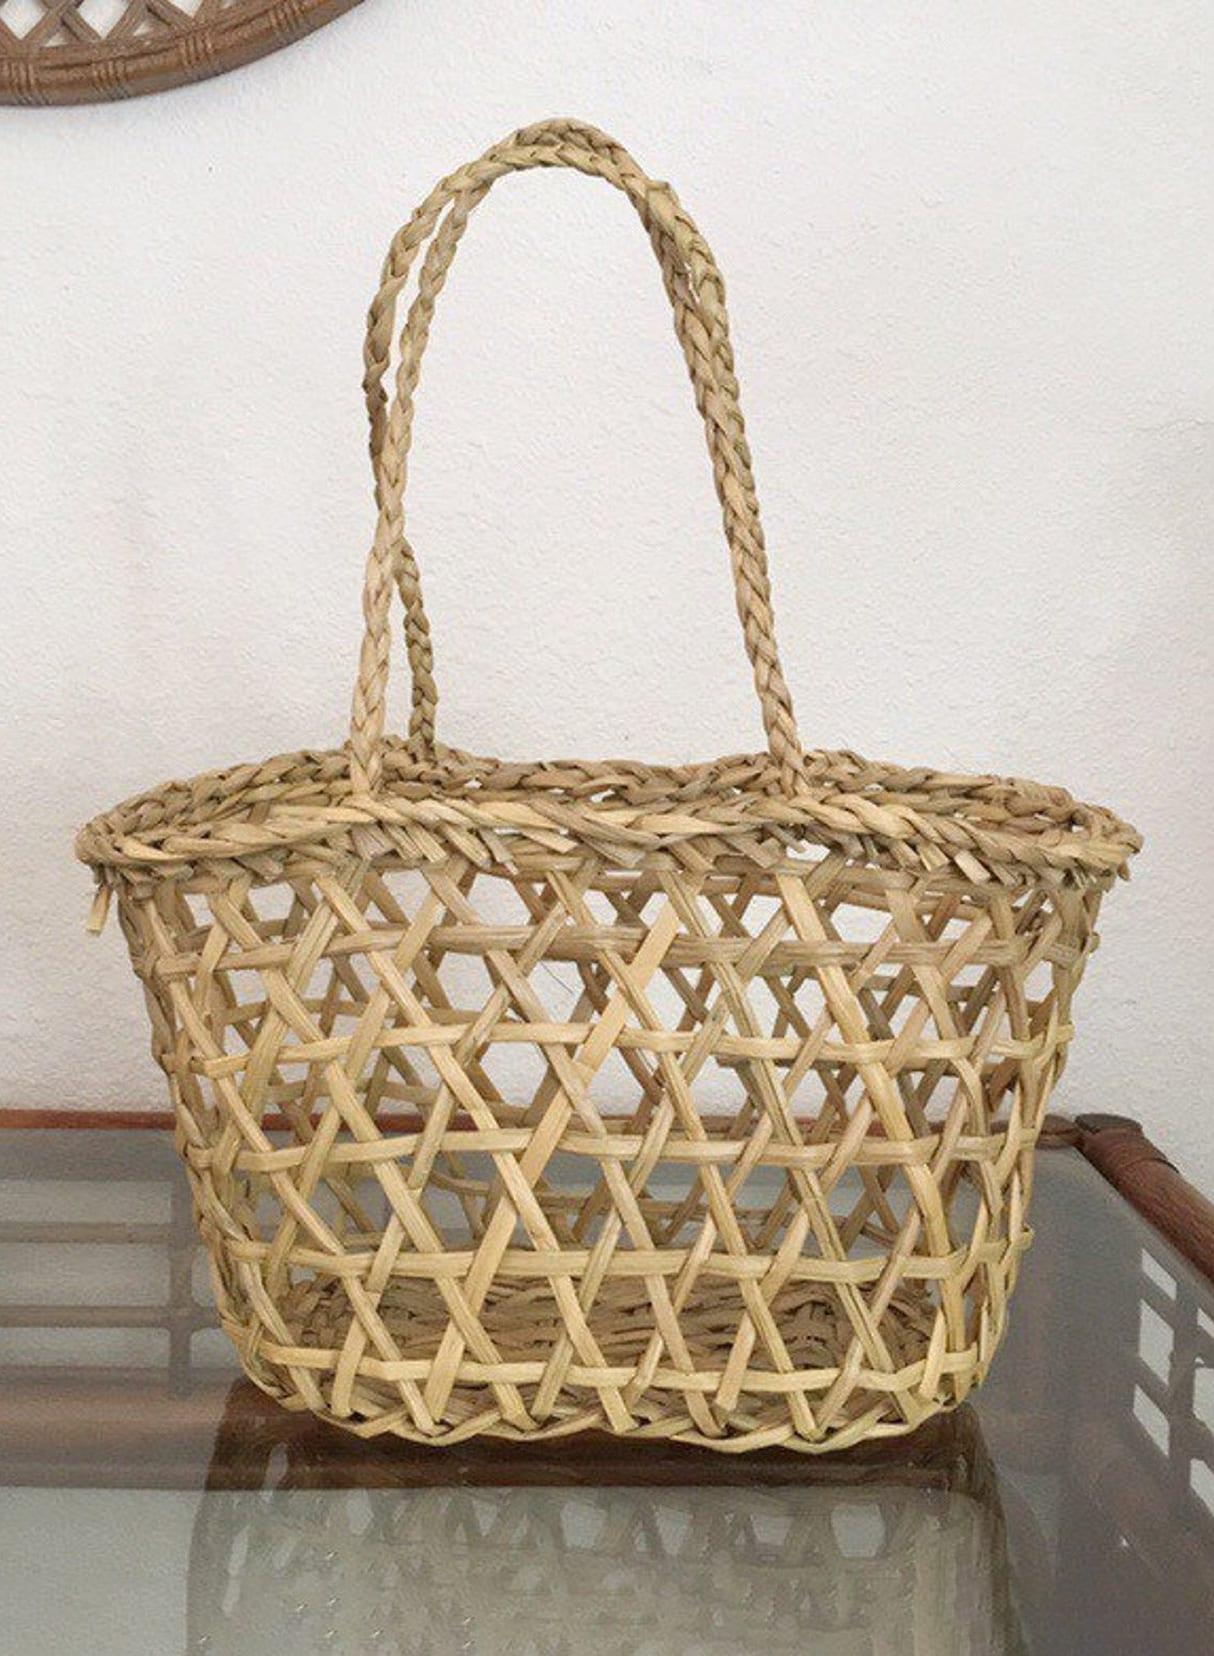 Vintage Summer Straw Tote Hand Purse - Beach Straw Tote Bag